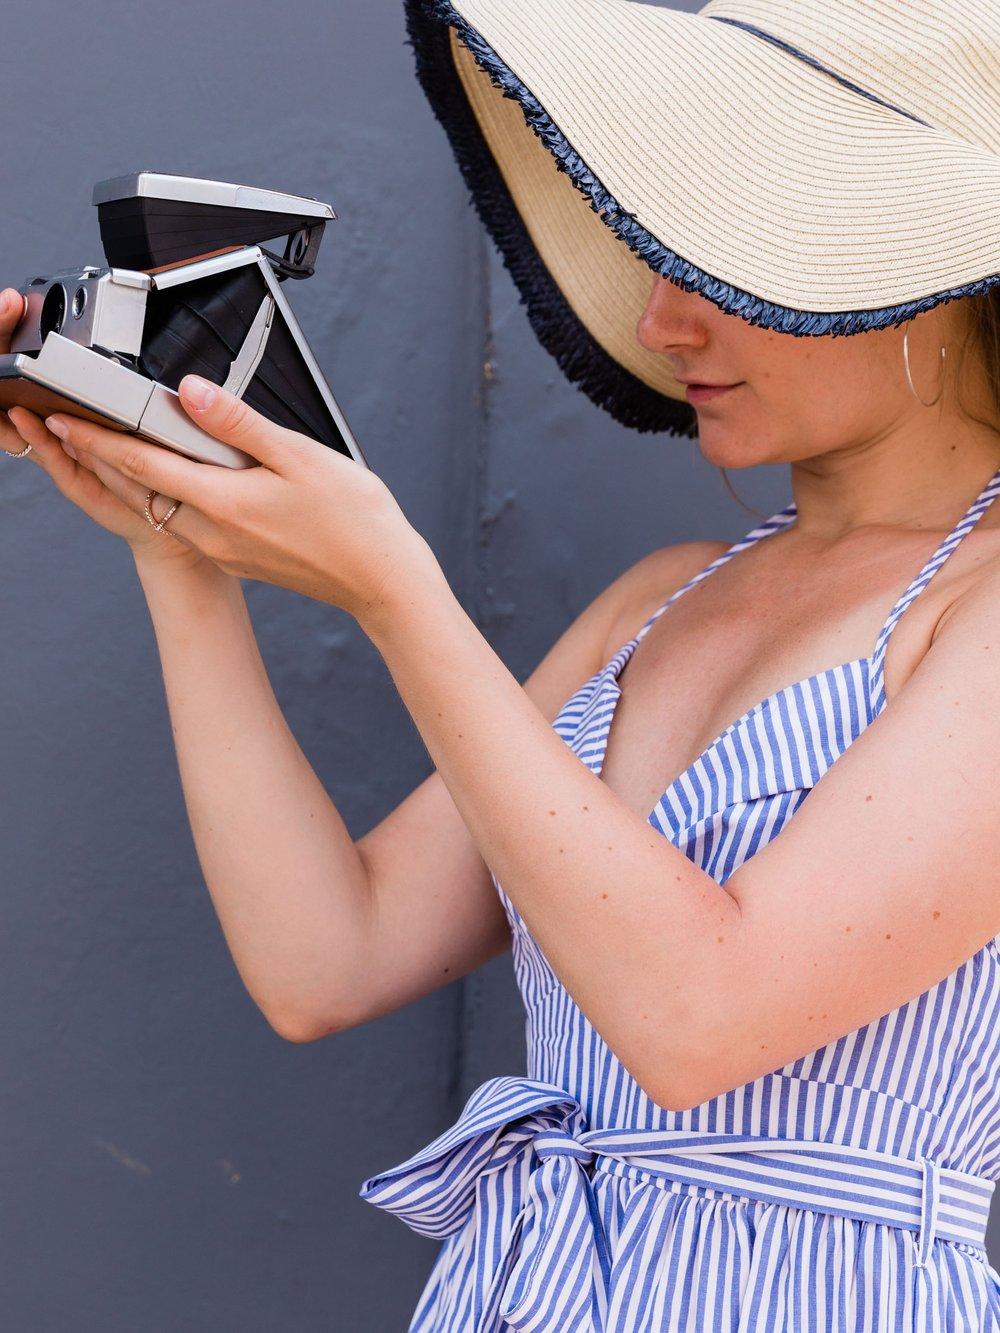 Summerlifestylephotographybytheelegantbrand.jpg